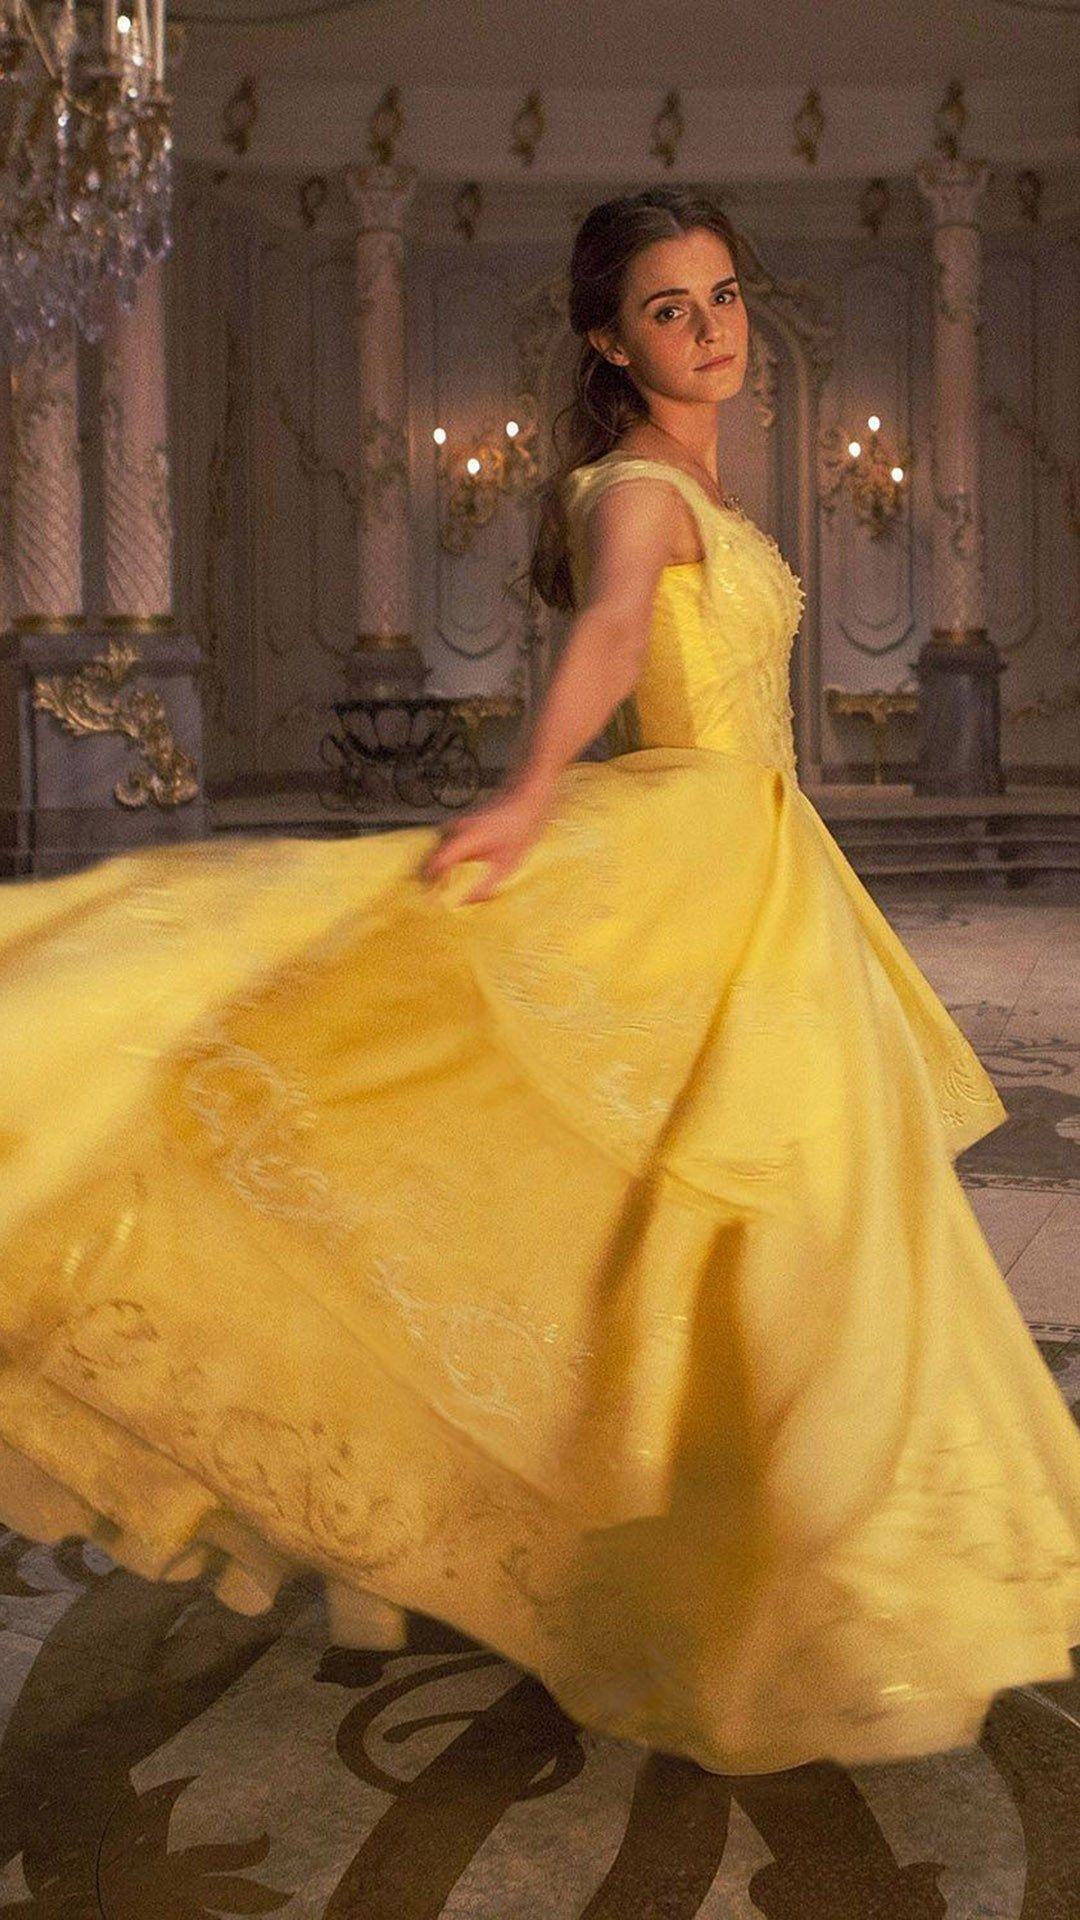 Disney Princess Belle Beauty And The Beast Ariel Emma Watson iphone case